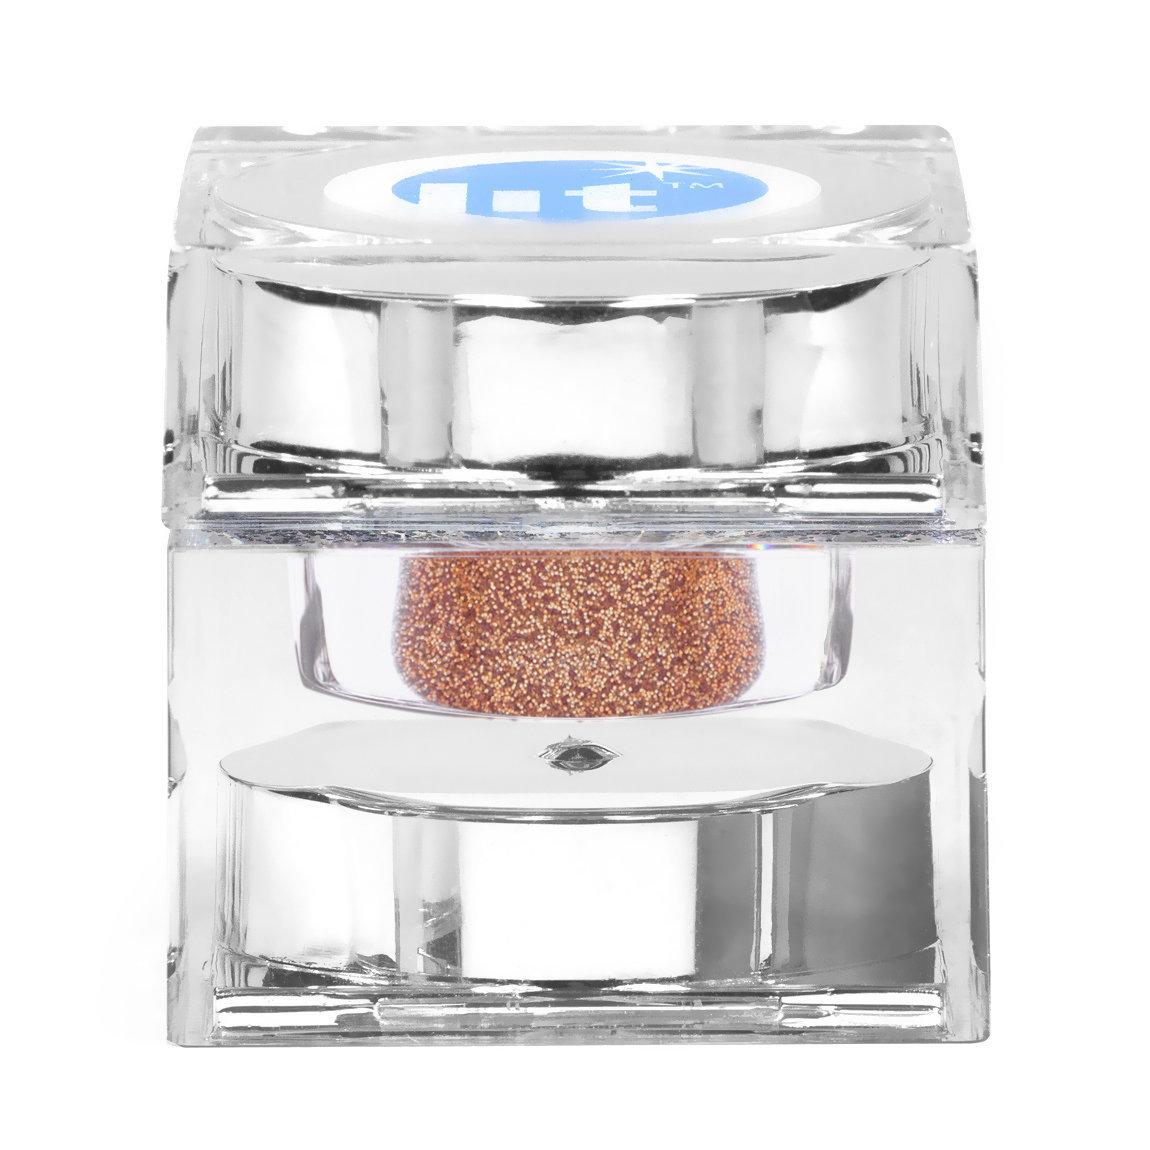 Lit Cosmetics Lit Glitter Fully Nude S2 alternative view 1.